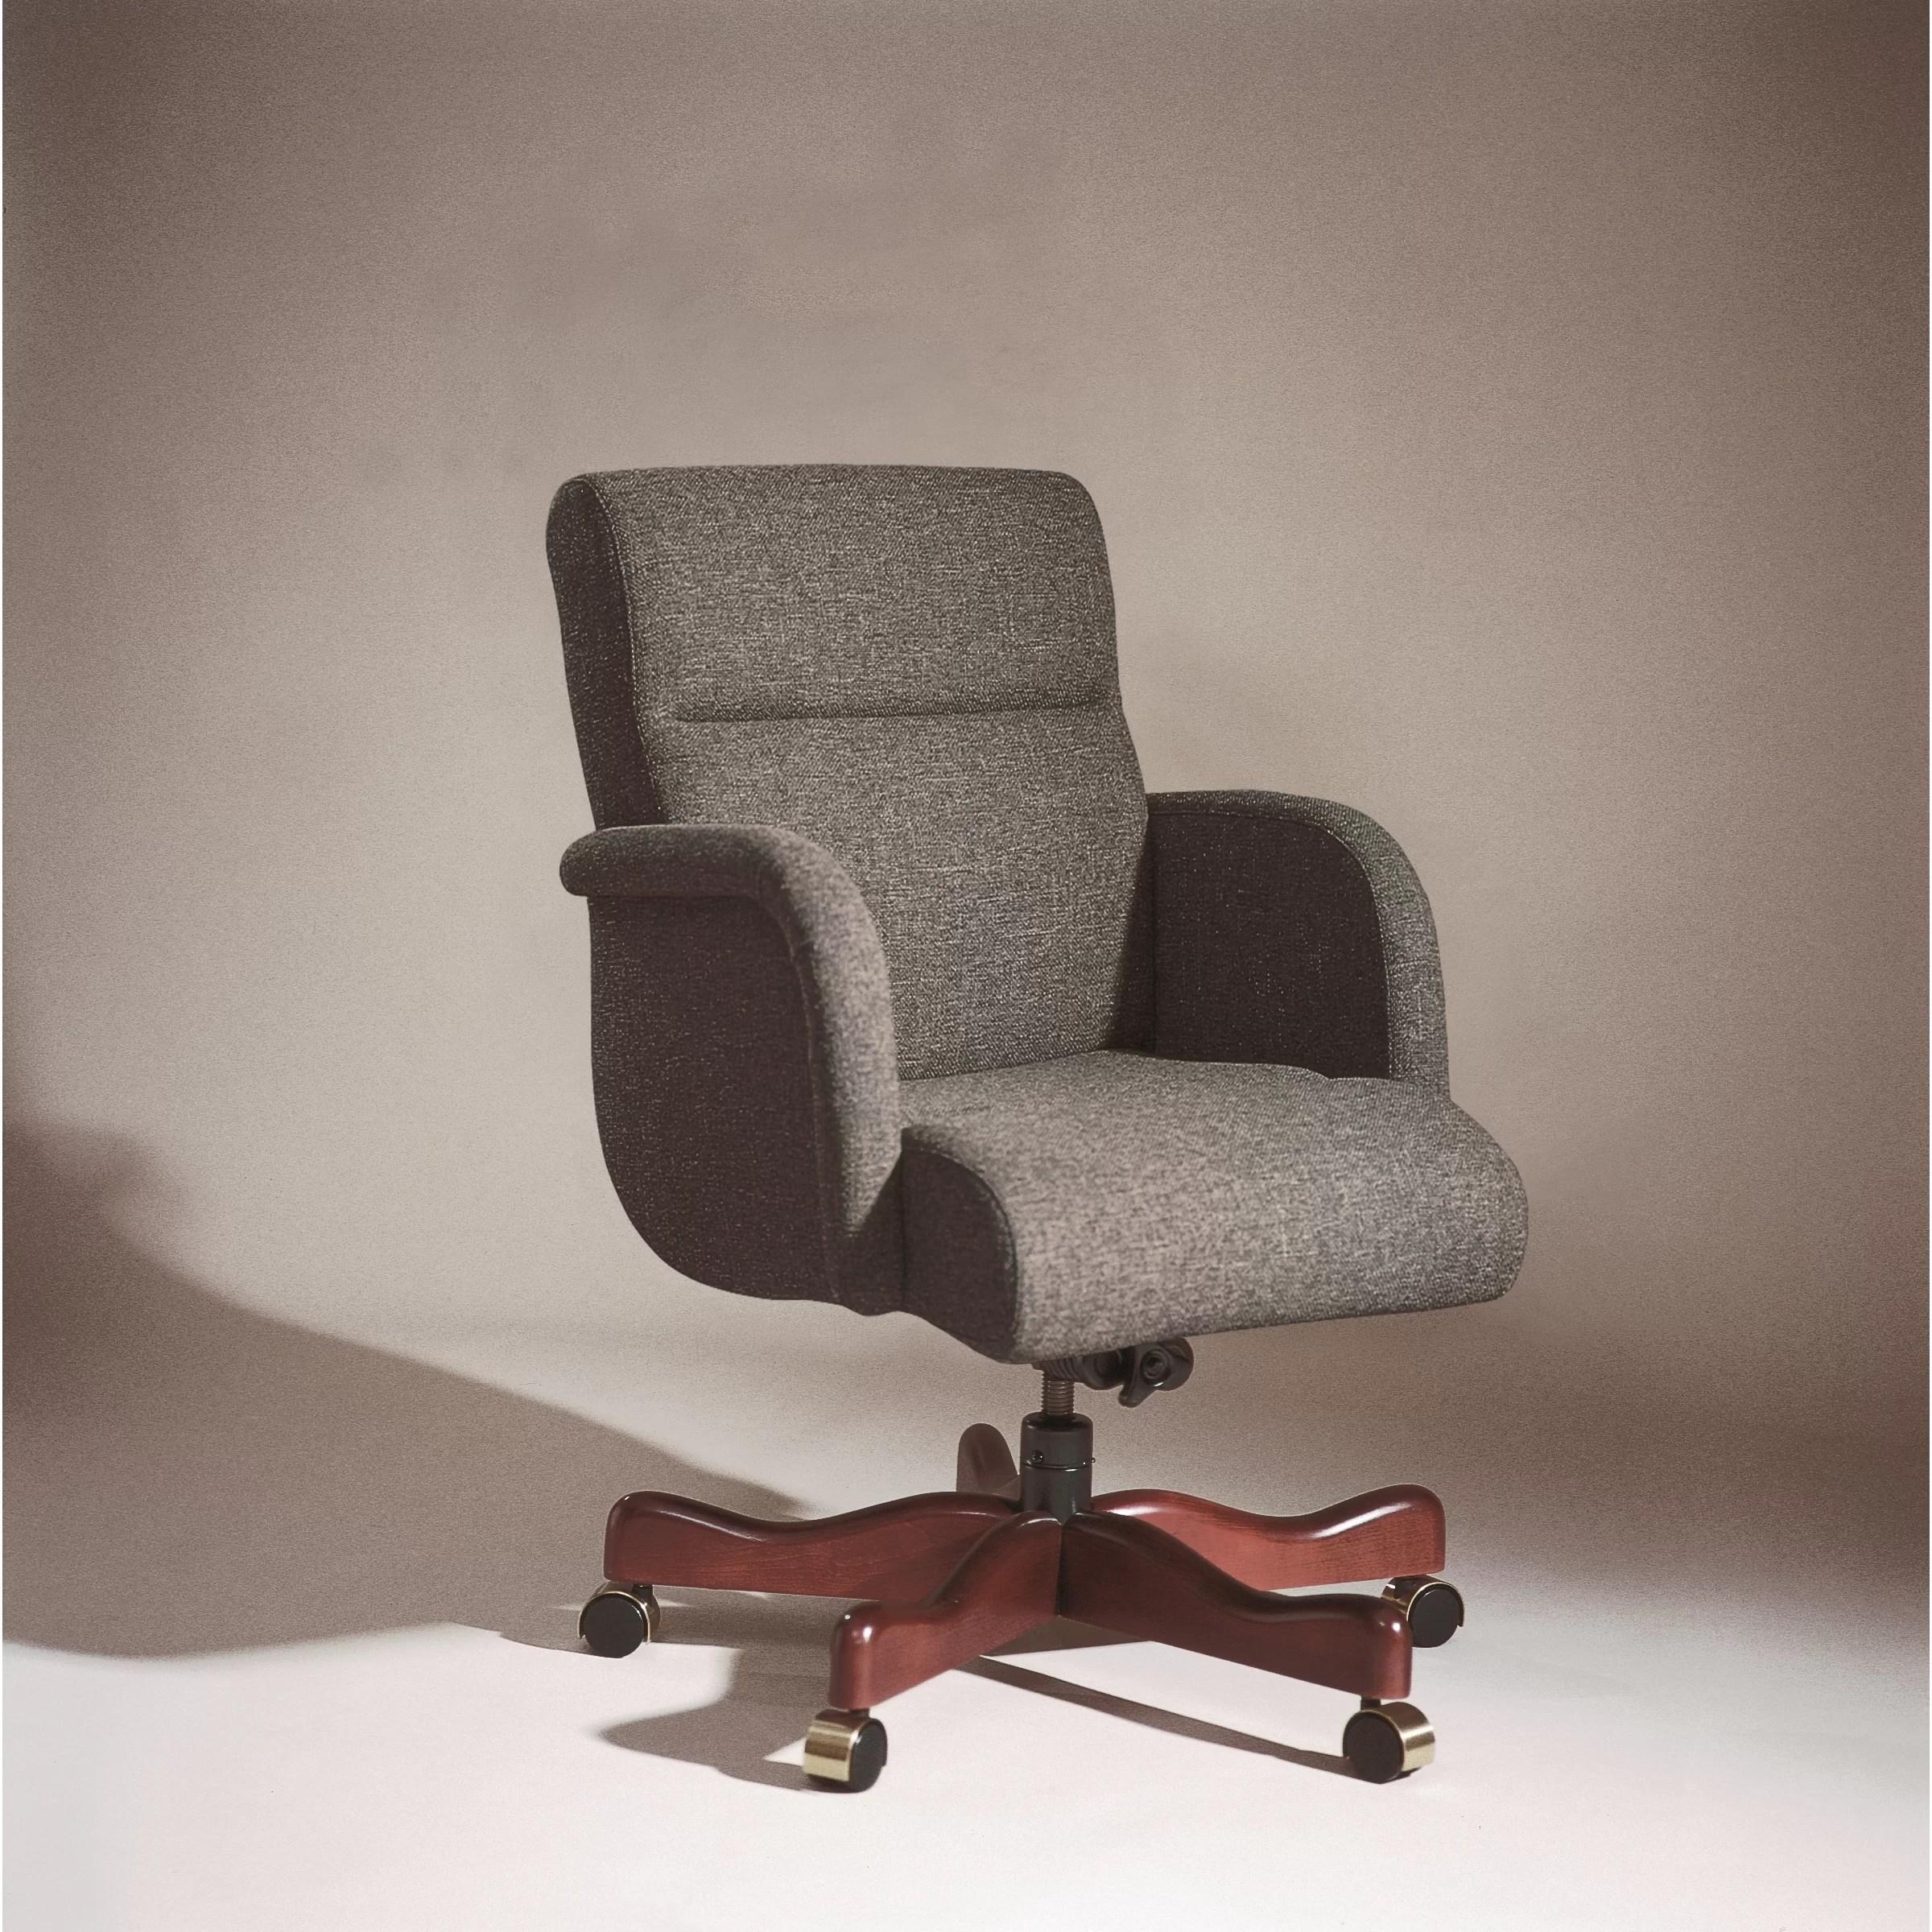 low back office chair foldingchairsandtables triune business furniture executive wayfair